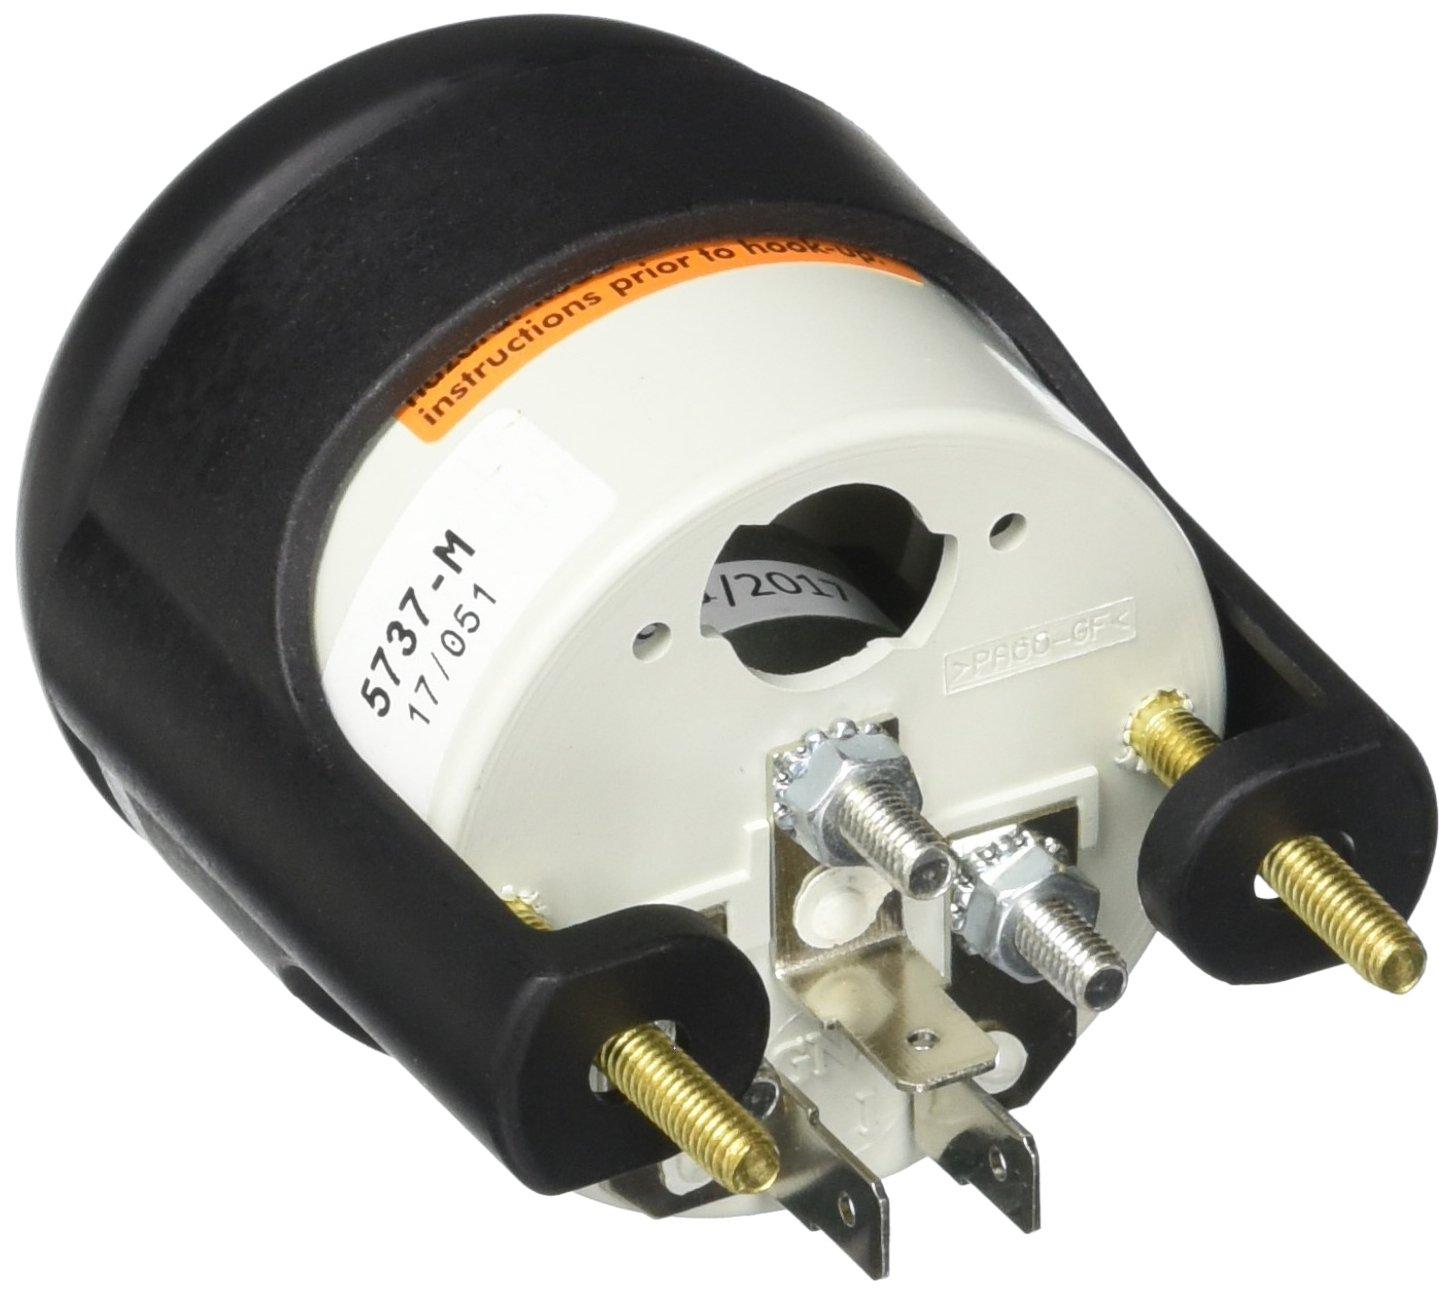 Auto Meter 5737M Phantom Metric Water Temperature Gauge